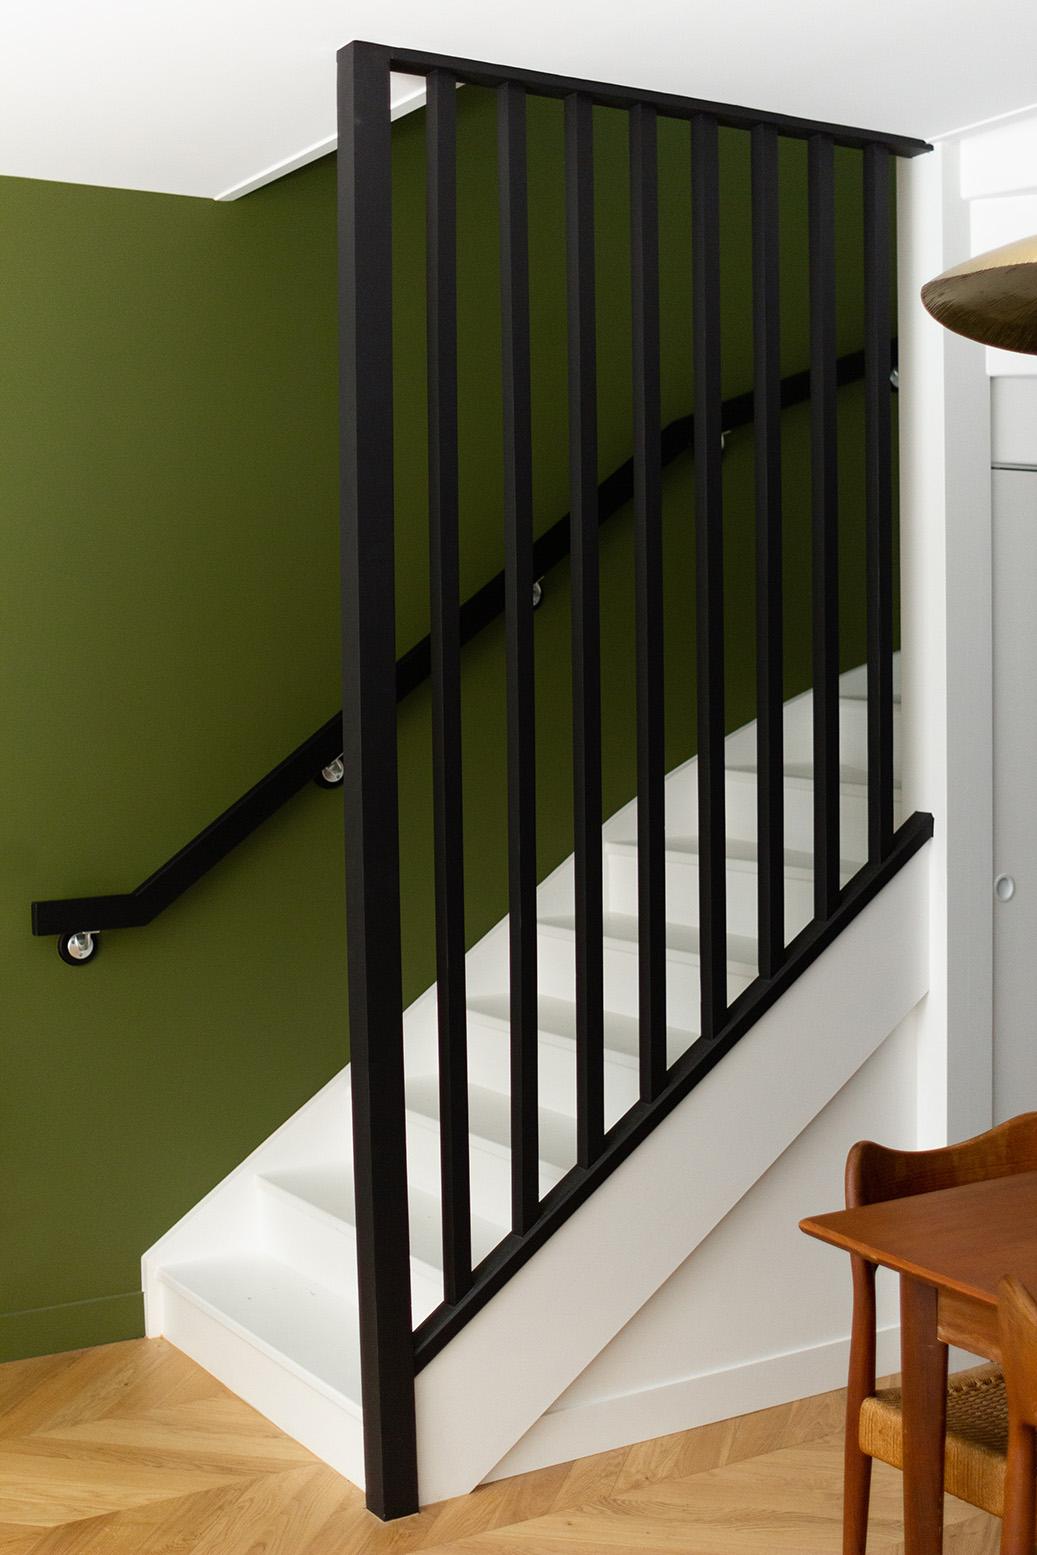 Rénovation haussmannien - garde-corps escalier noir - mur Bancha Farrow & Ball - Architecte intérieur Paris - Studio Mariekke